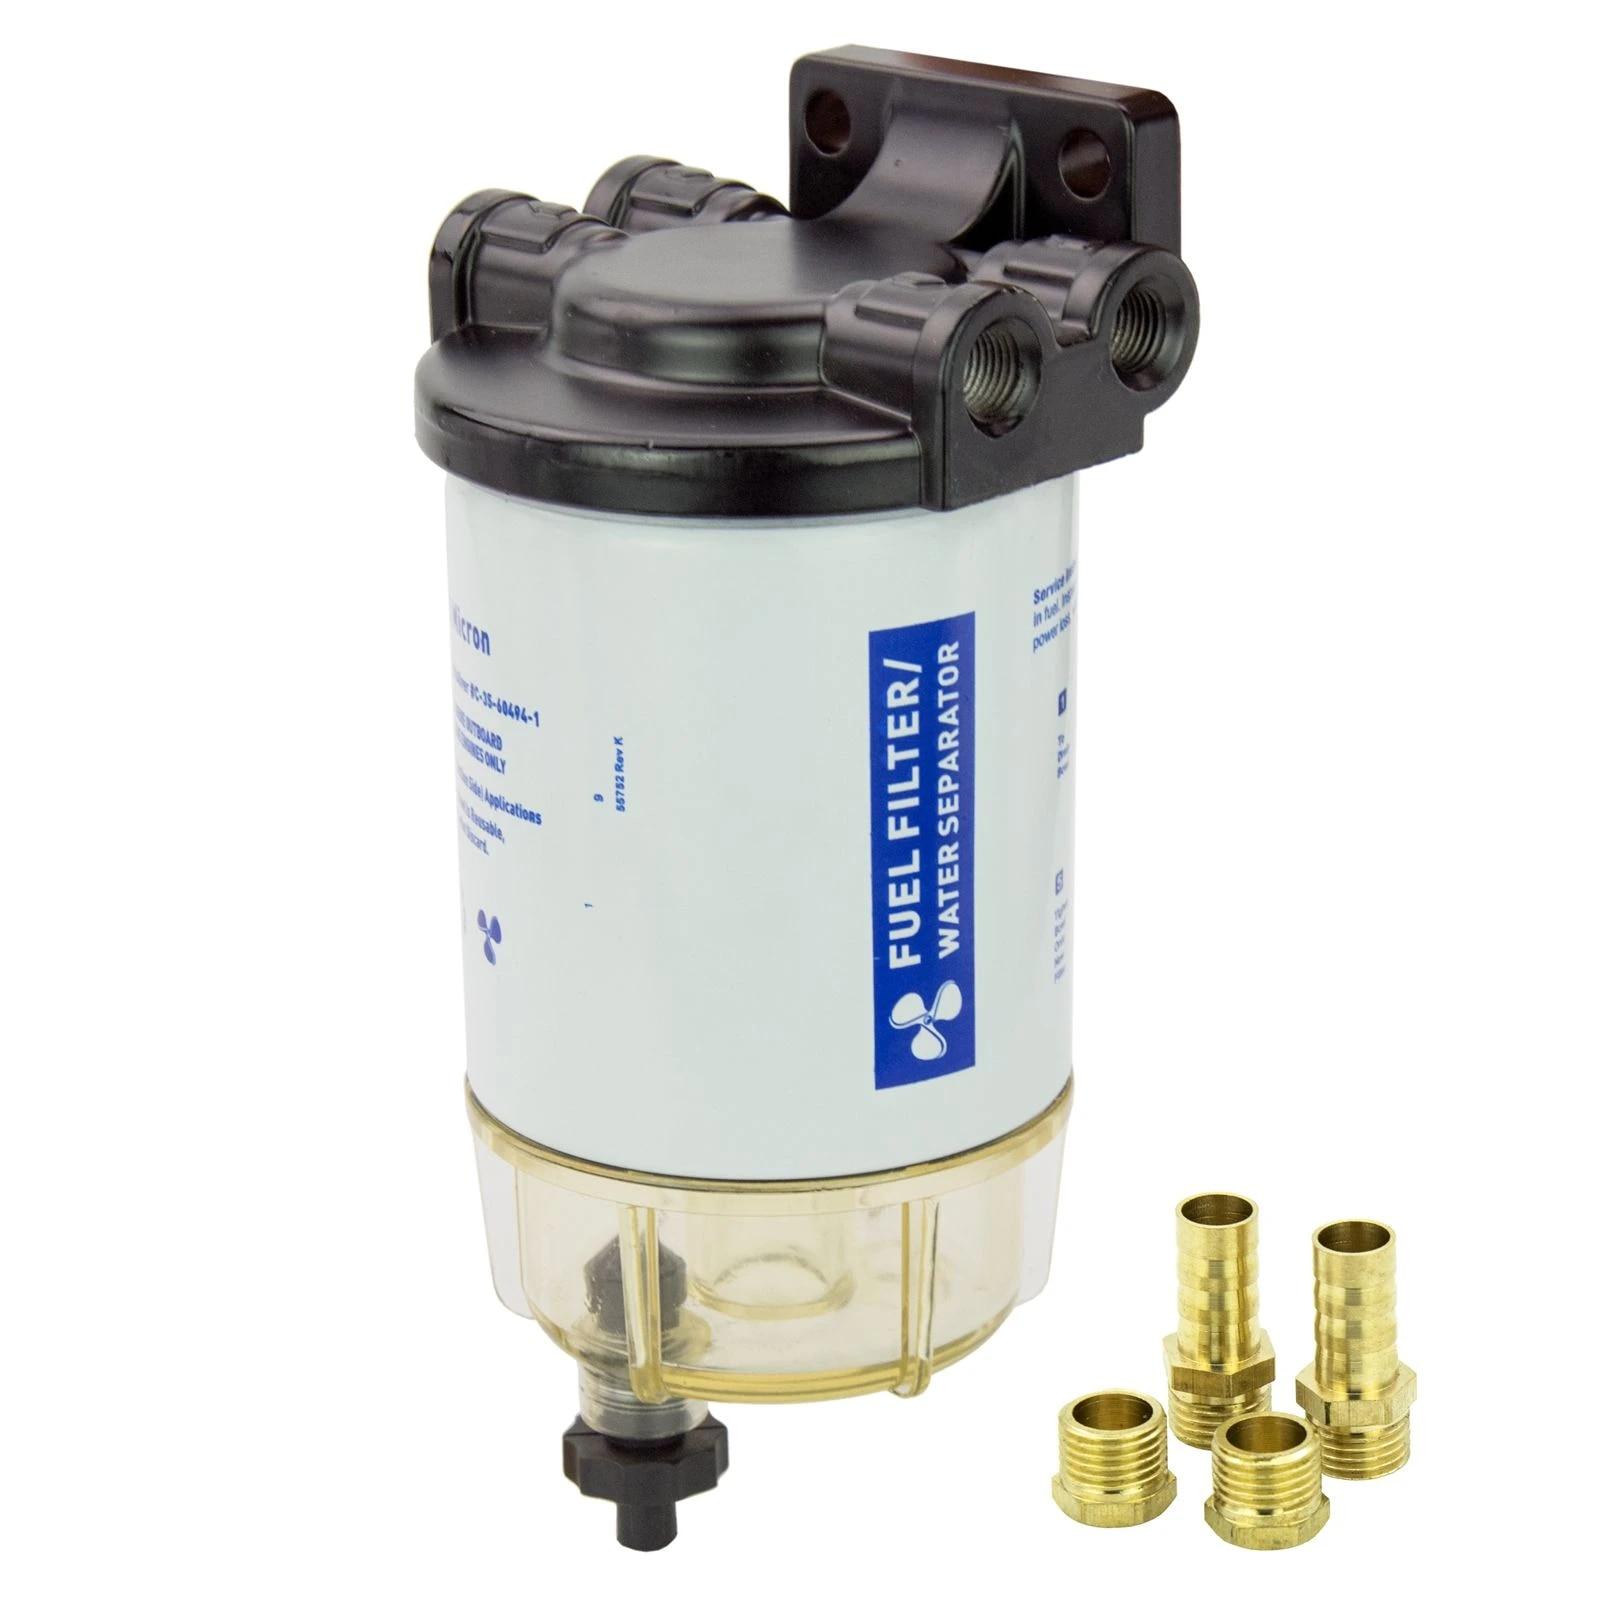 Yamaha Water Separator Filter For Drain Bowl Type 600-456 Mariner Mercury